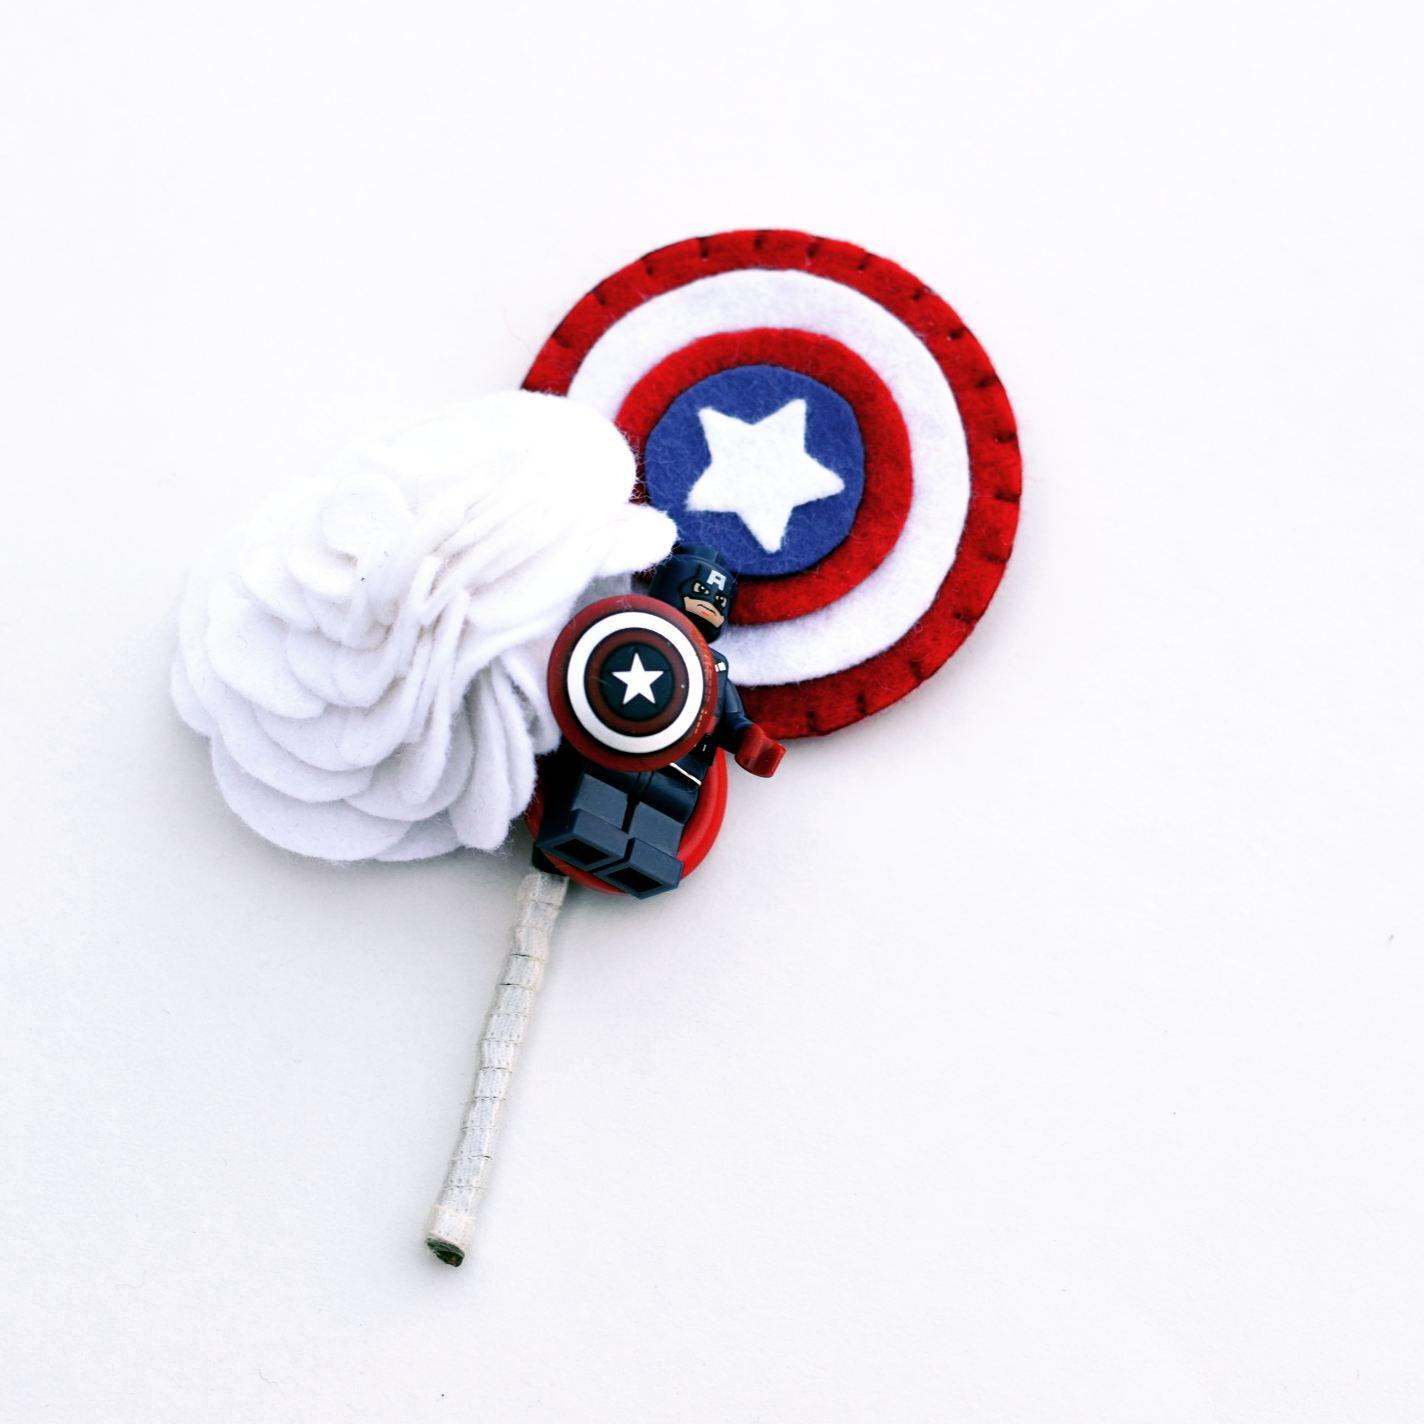 Photo by Charlotte Laurie designs - alternative wedding buttonhole - captain america button hole